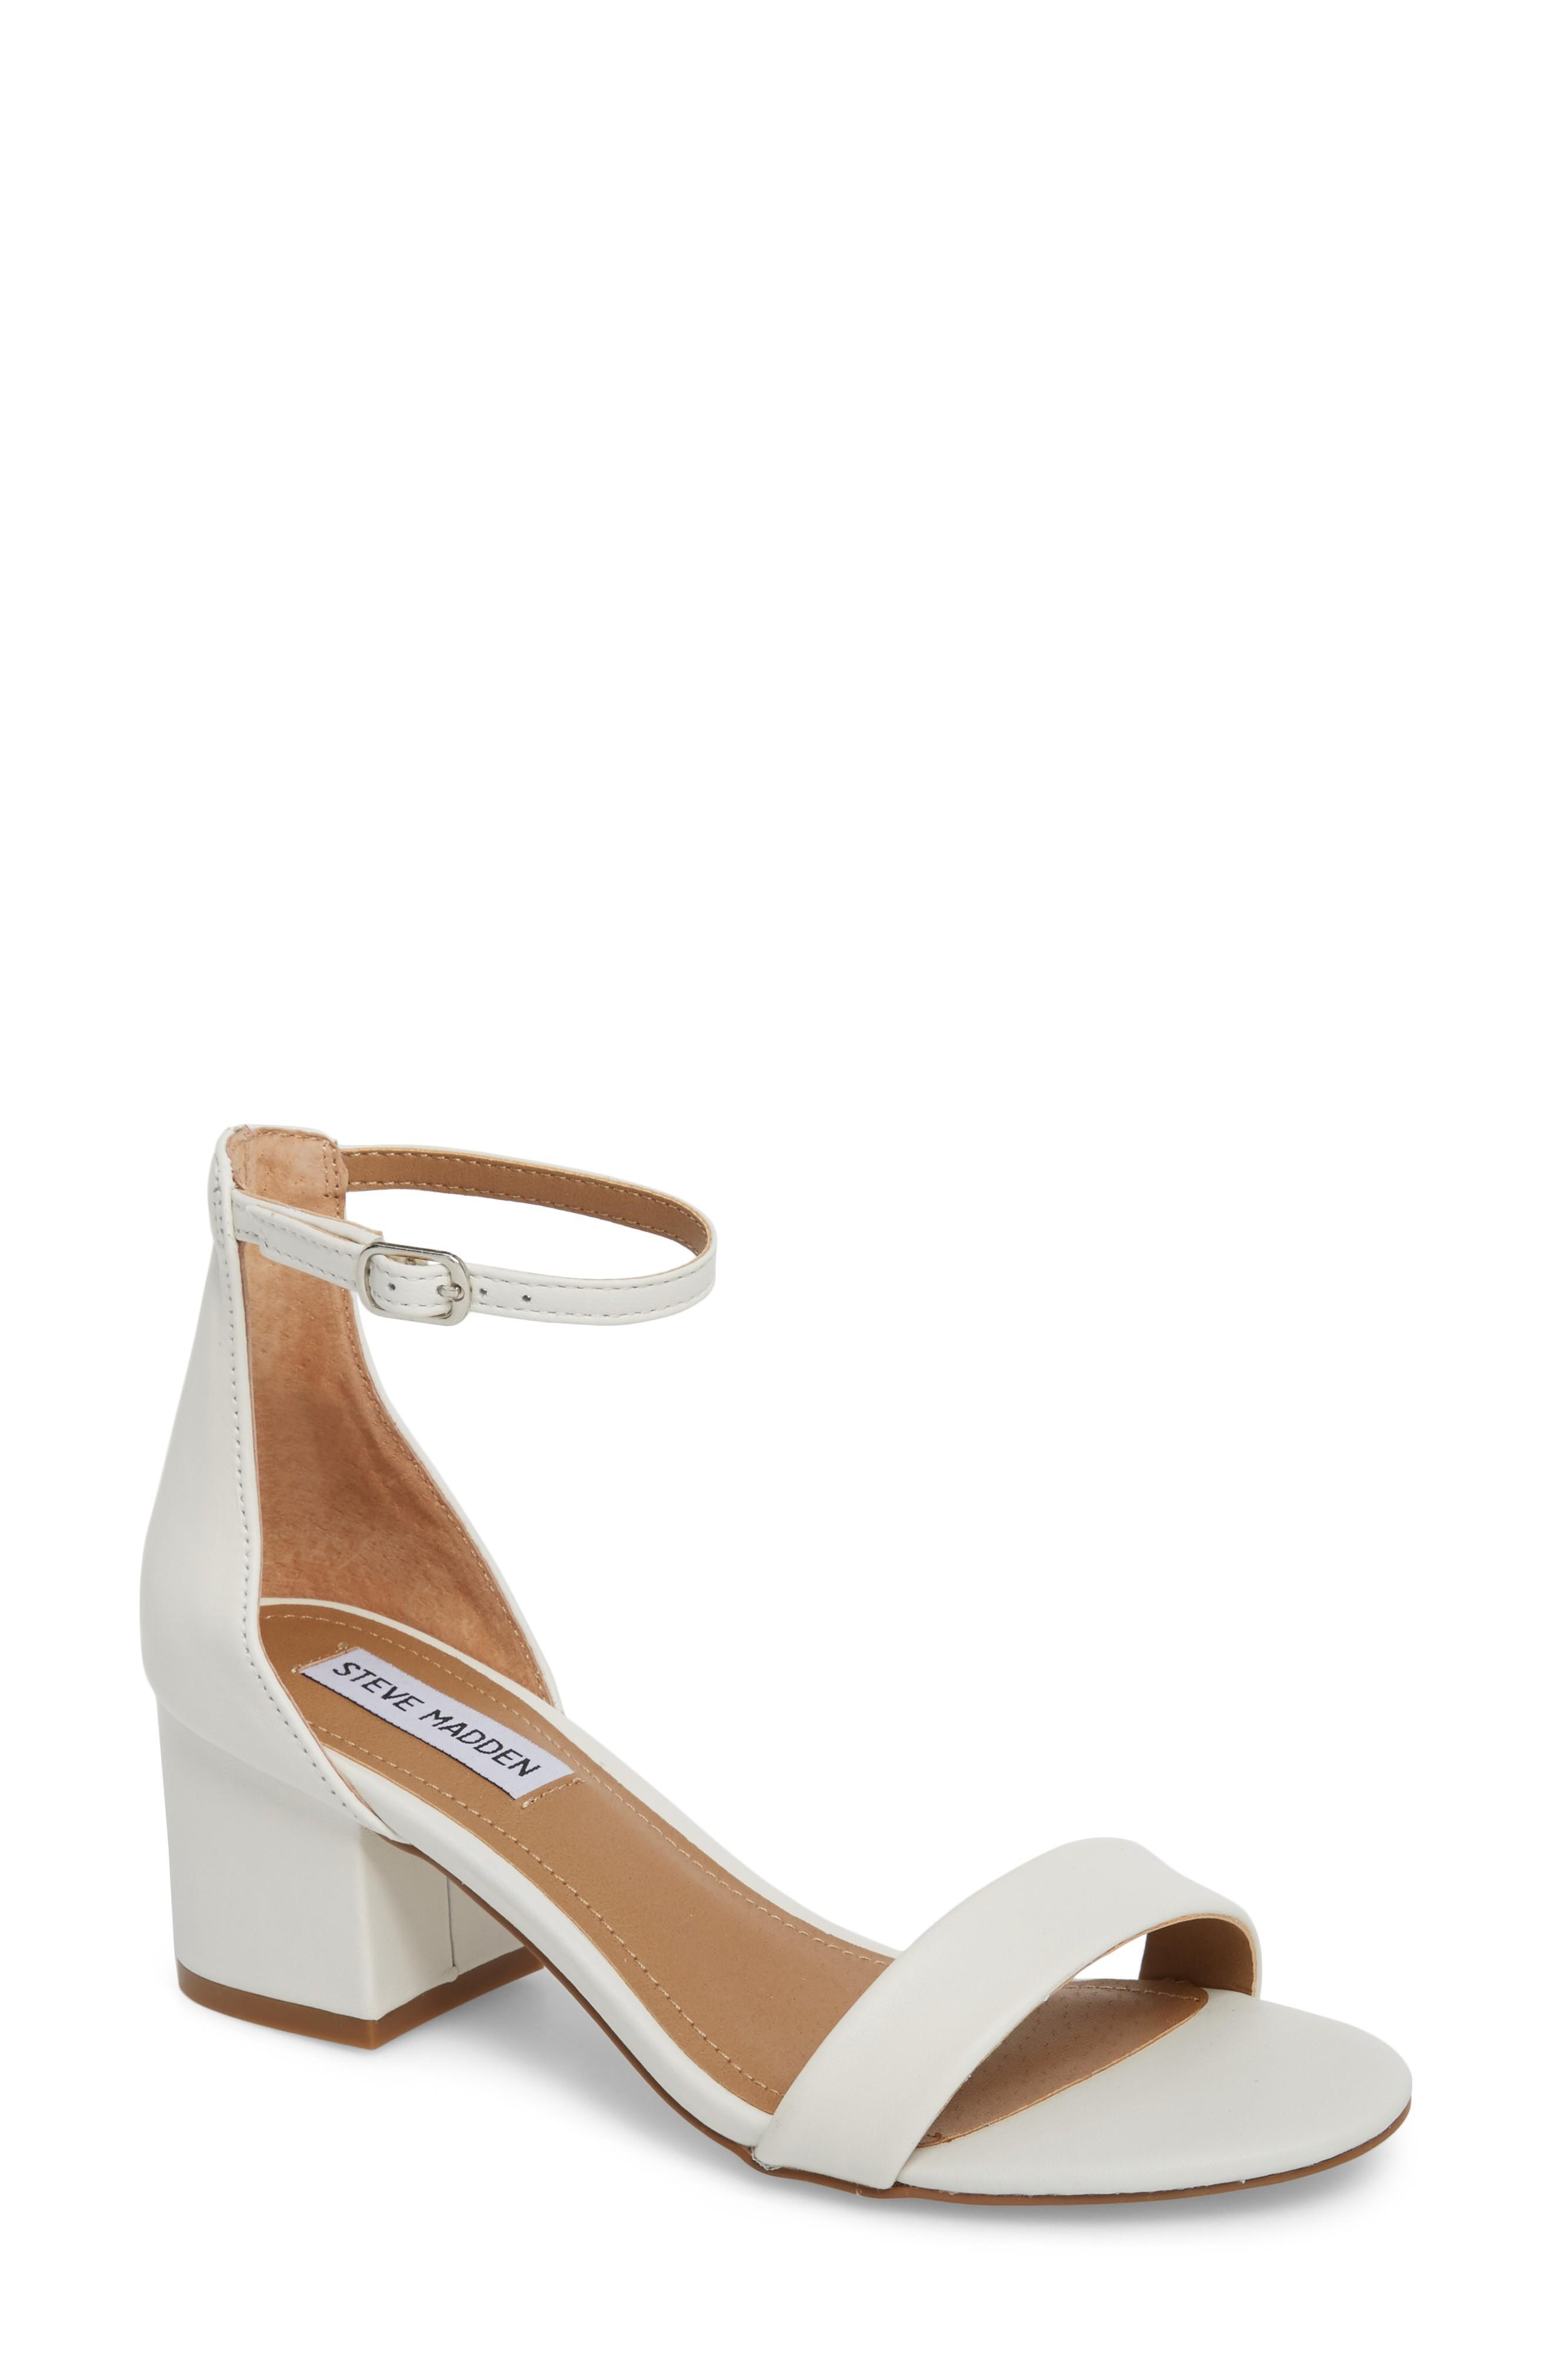 f9f3fb88149 Steve Madden Irenee Ankle Strap Sandal In White Leather